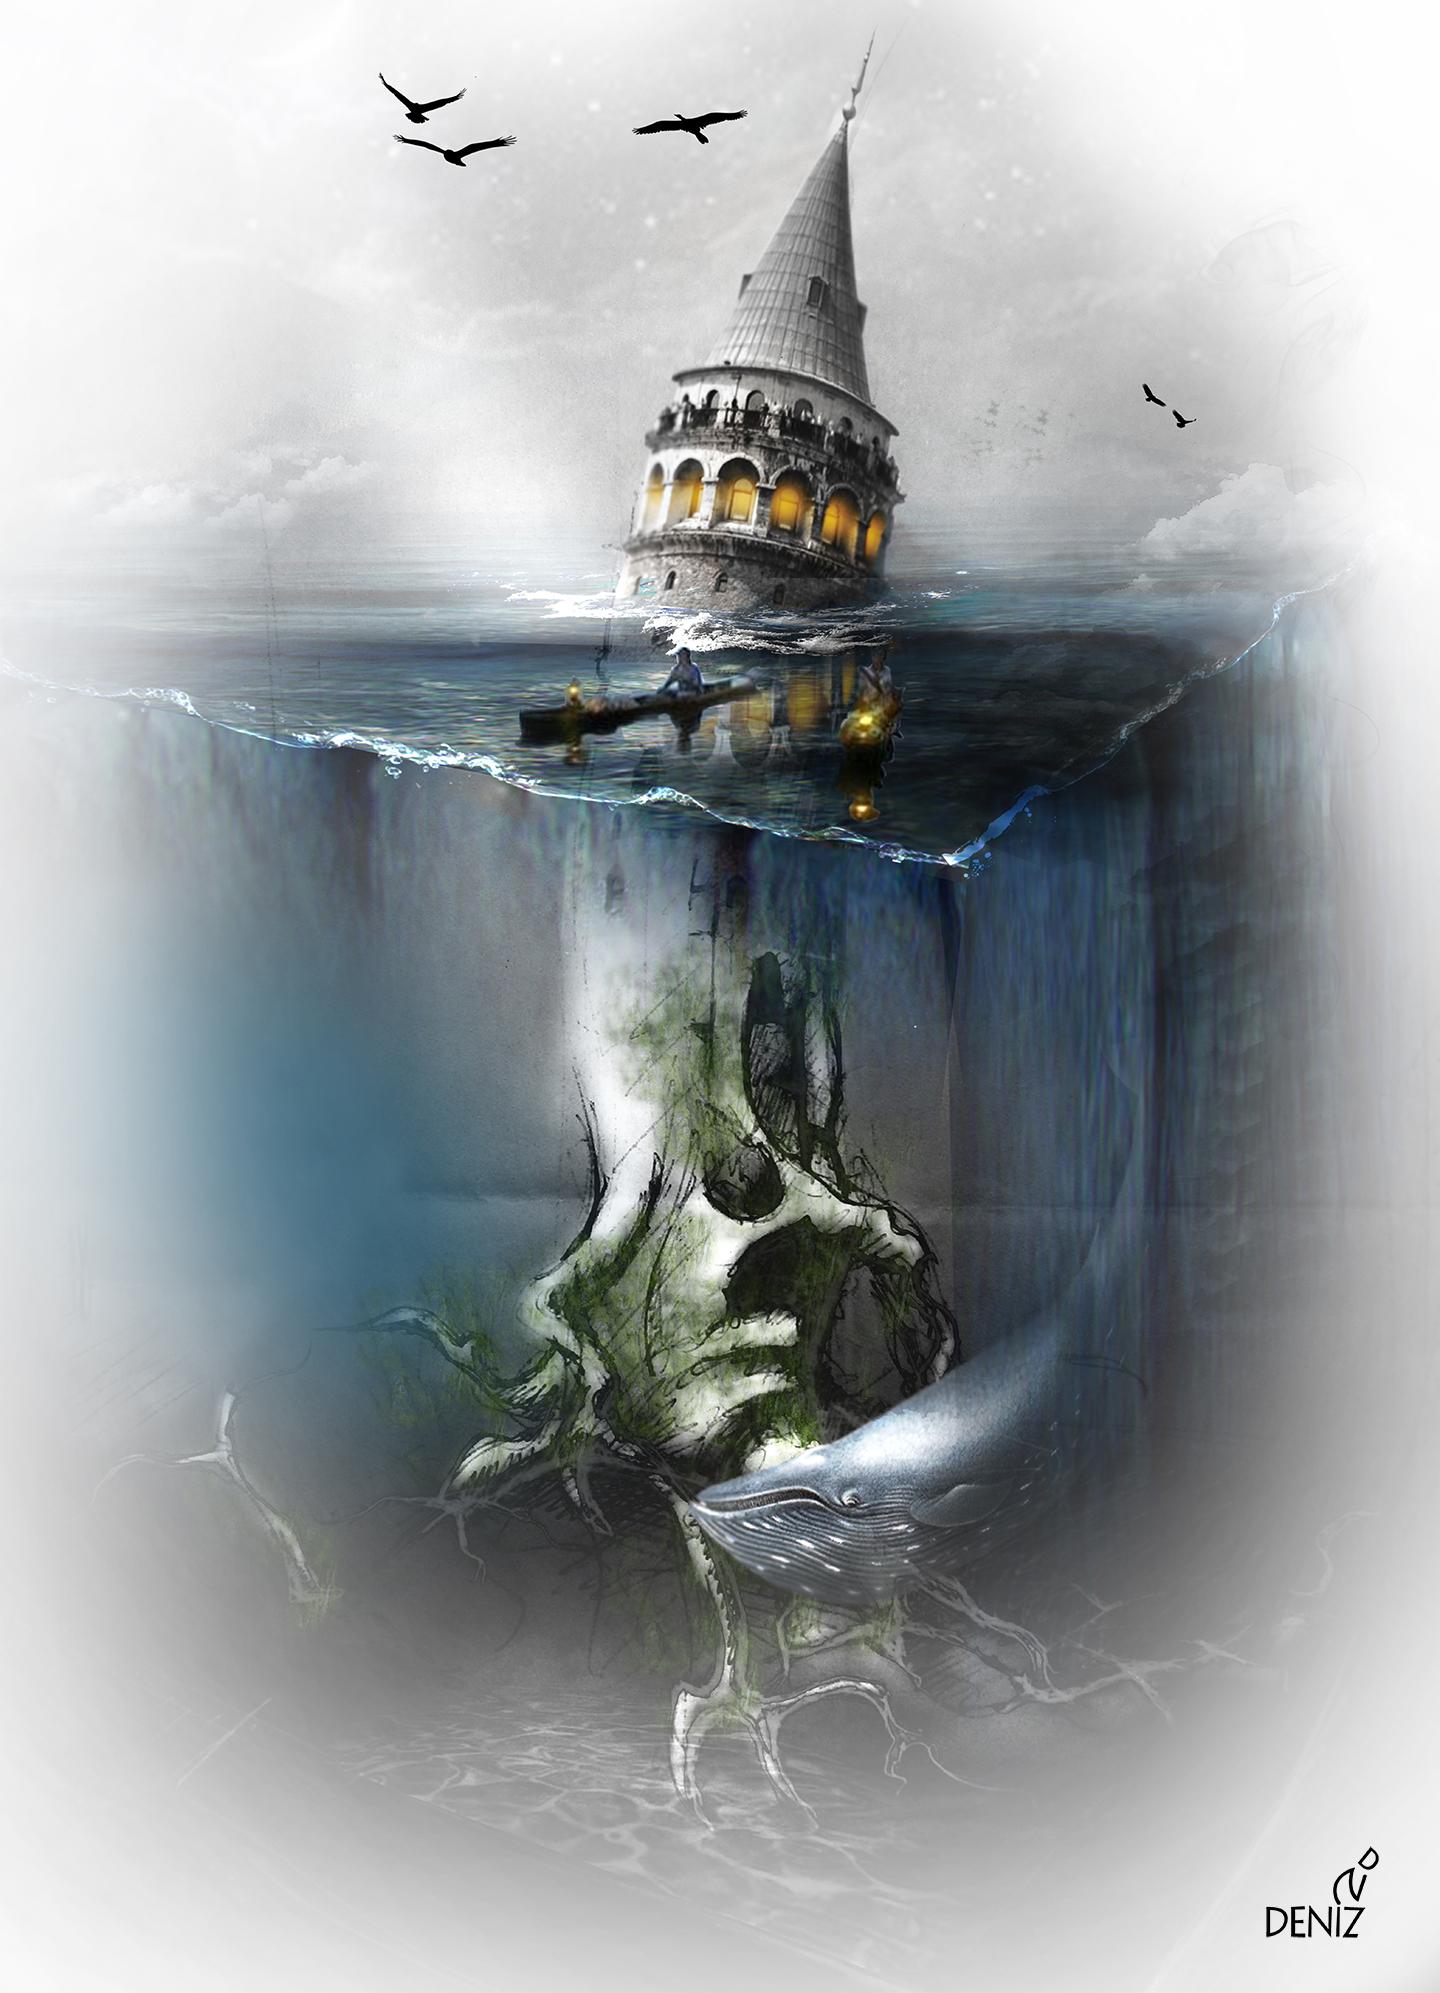 Deniz Dsgn Kule By Deniz Dsgn On DeviantART